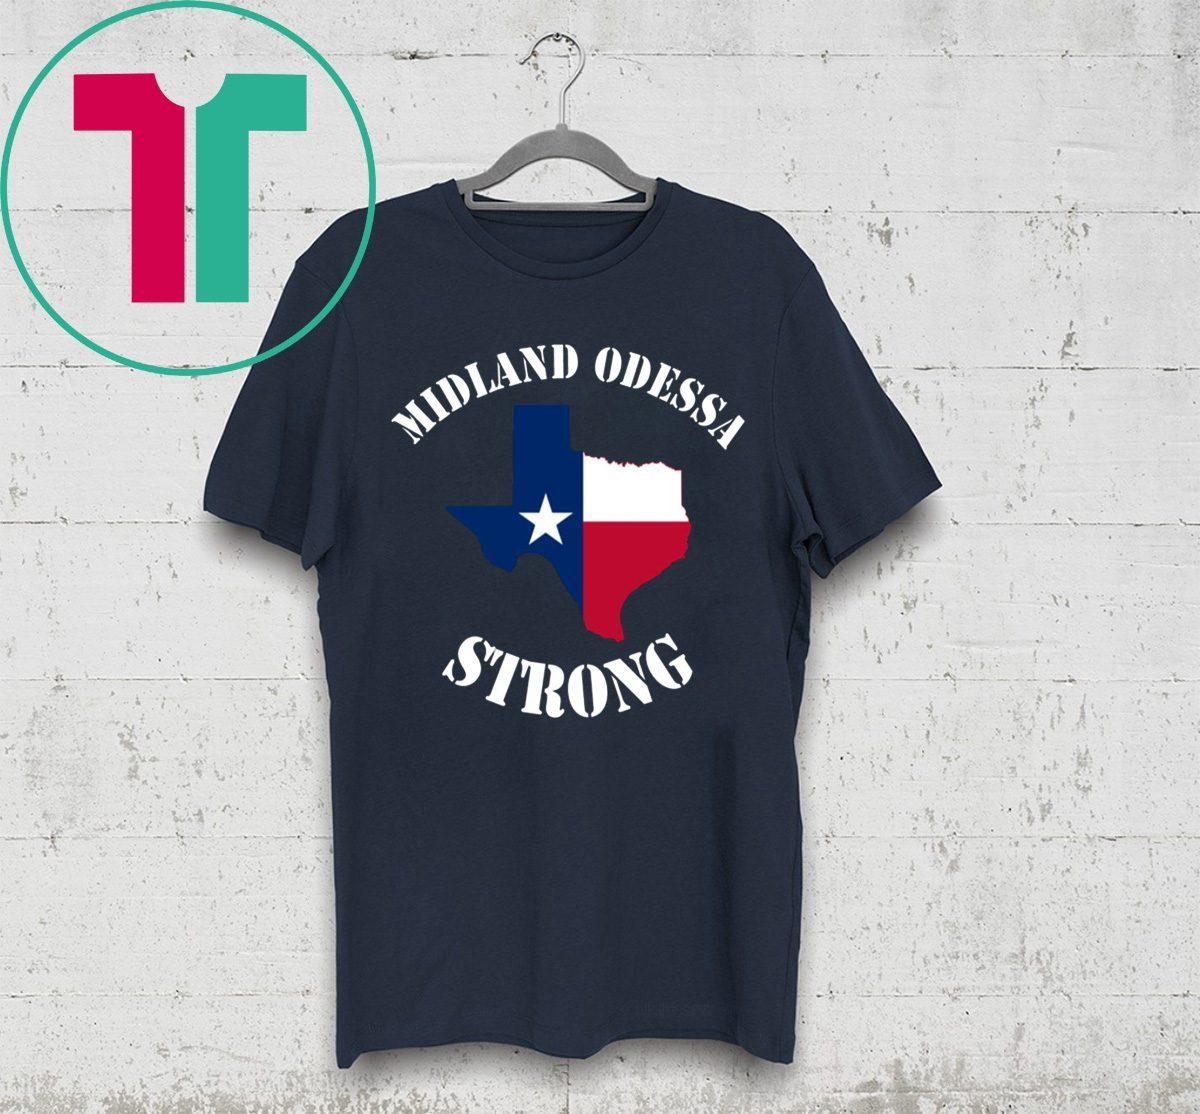 Midland Odessa Strong #MidlandOdessaStrong Shirt